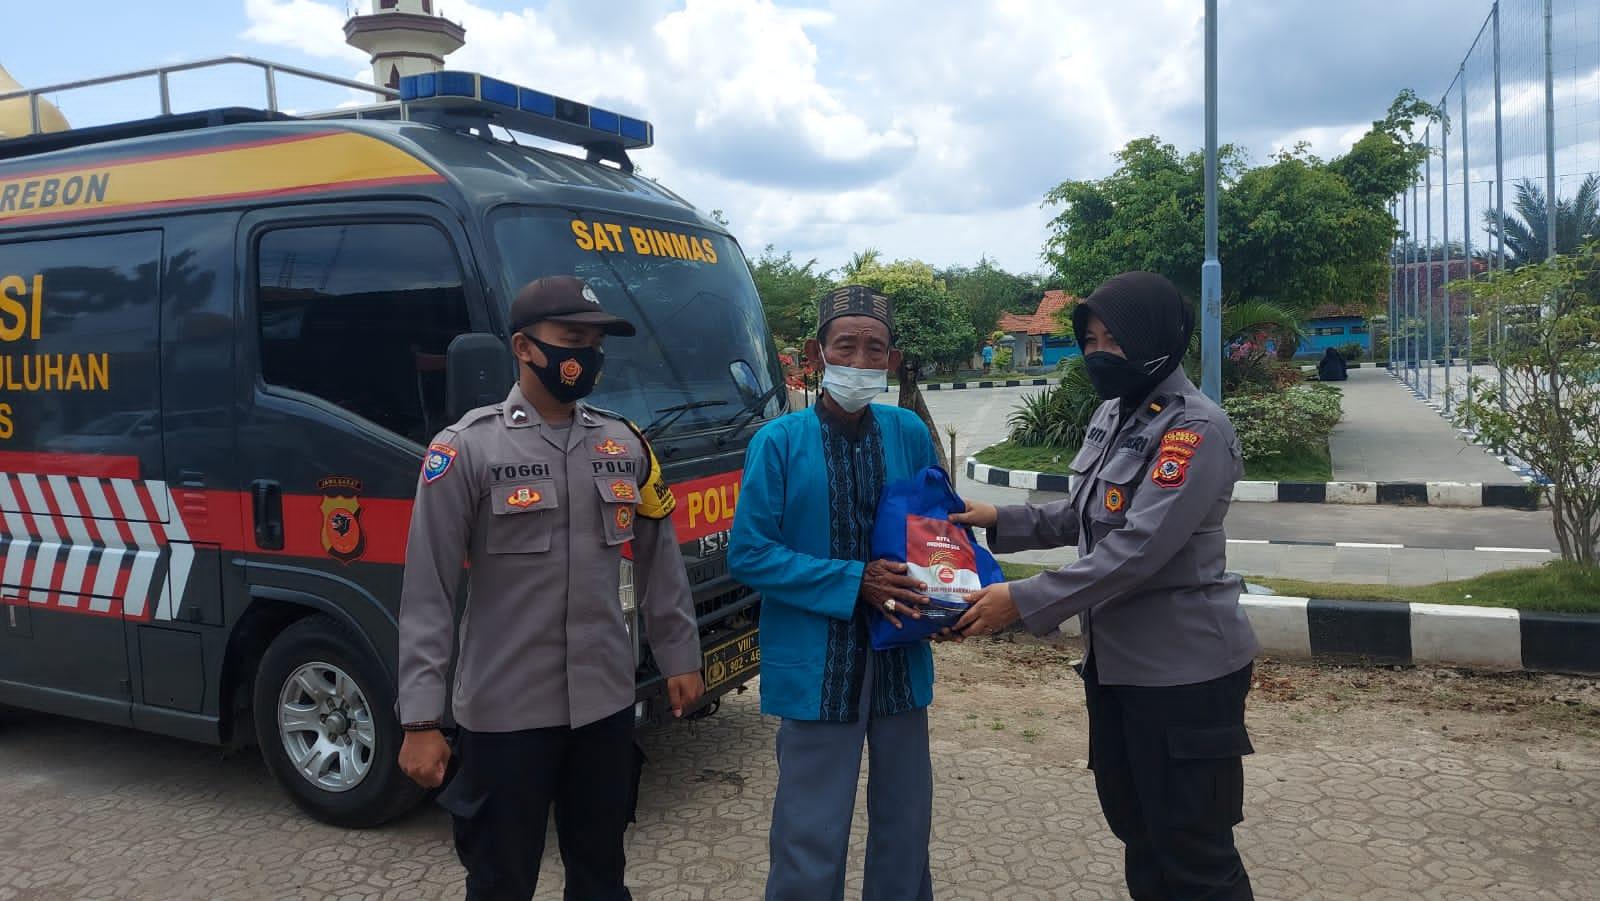 Dua Desa Di Kecamatan Sedong Terima Bantuan Sosial Dari Polresta Cirebon